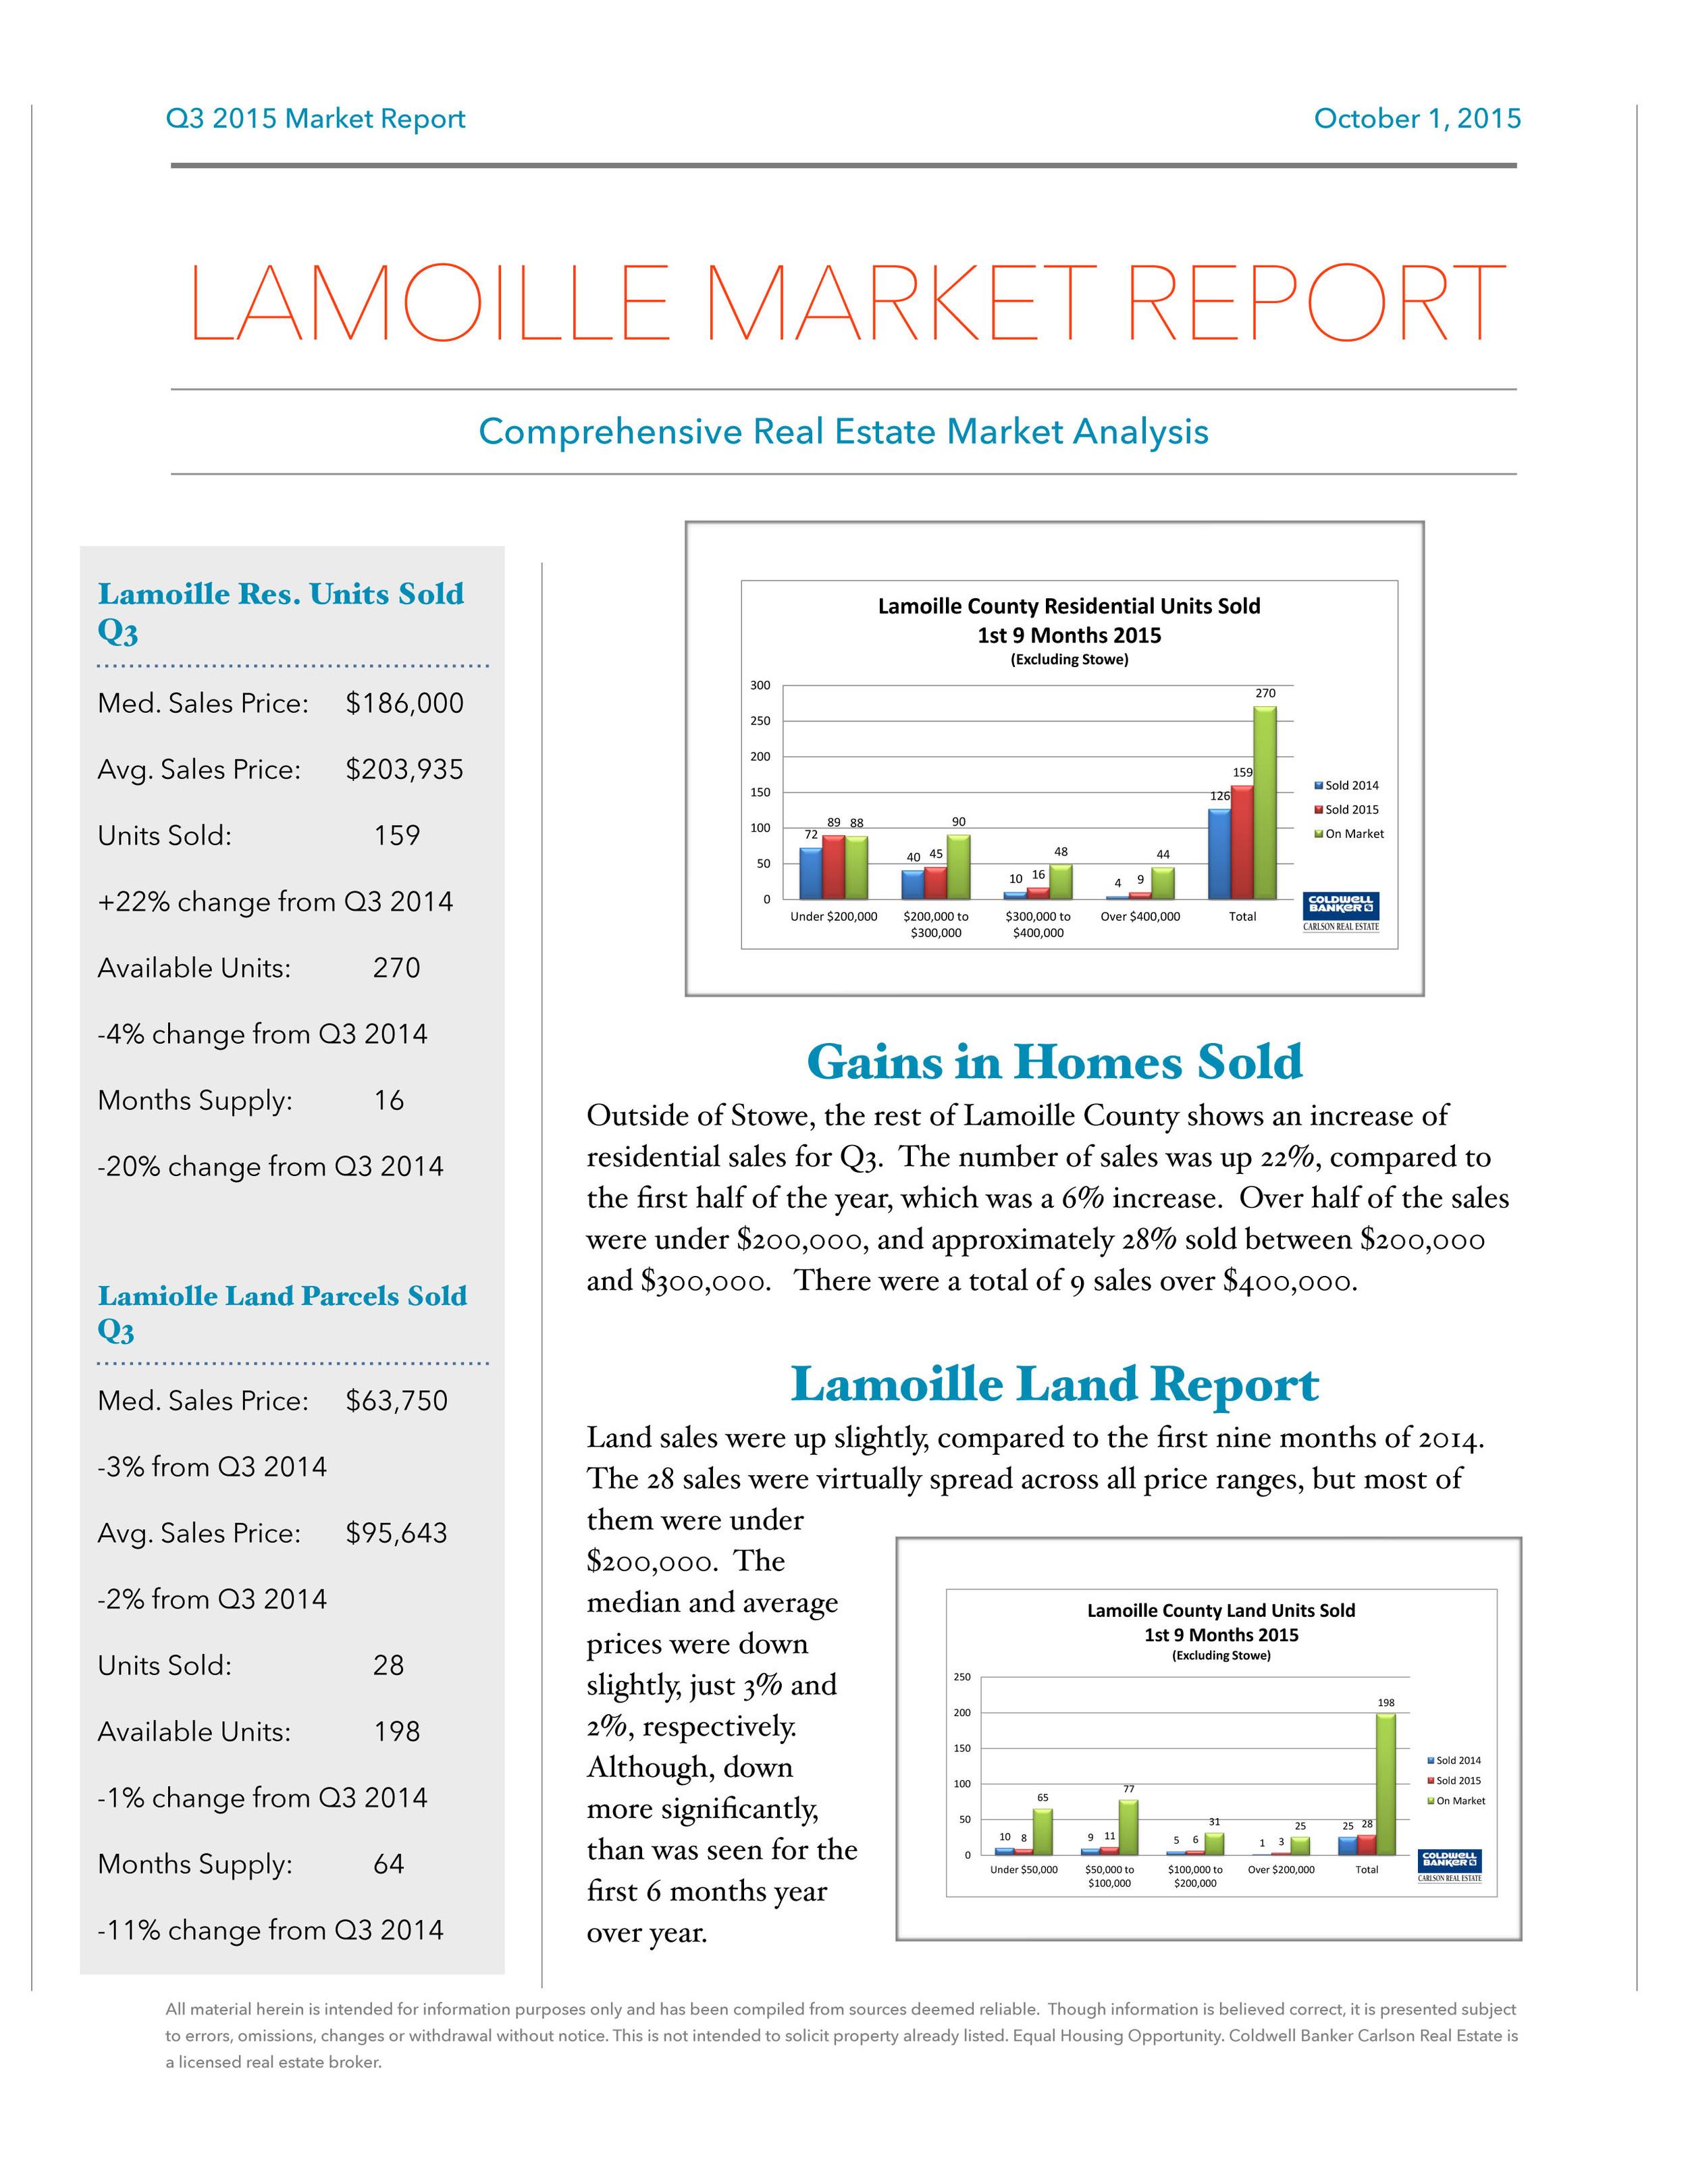 Q3 2015 Market Report Draft Lamoille